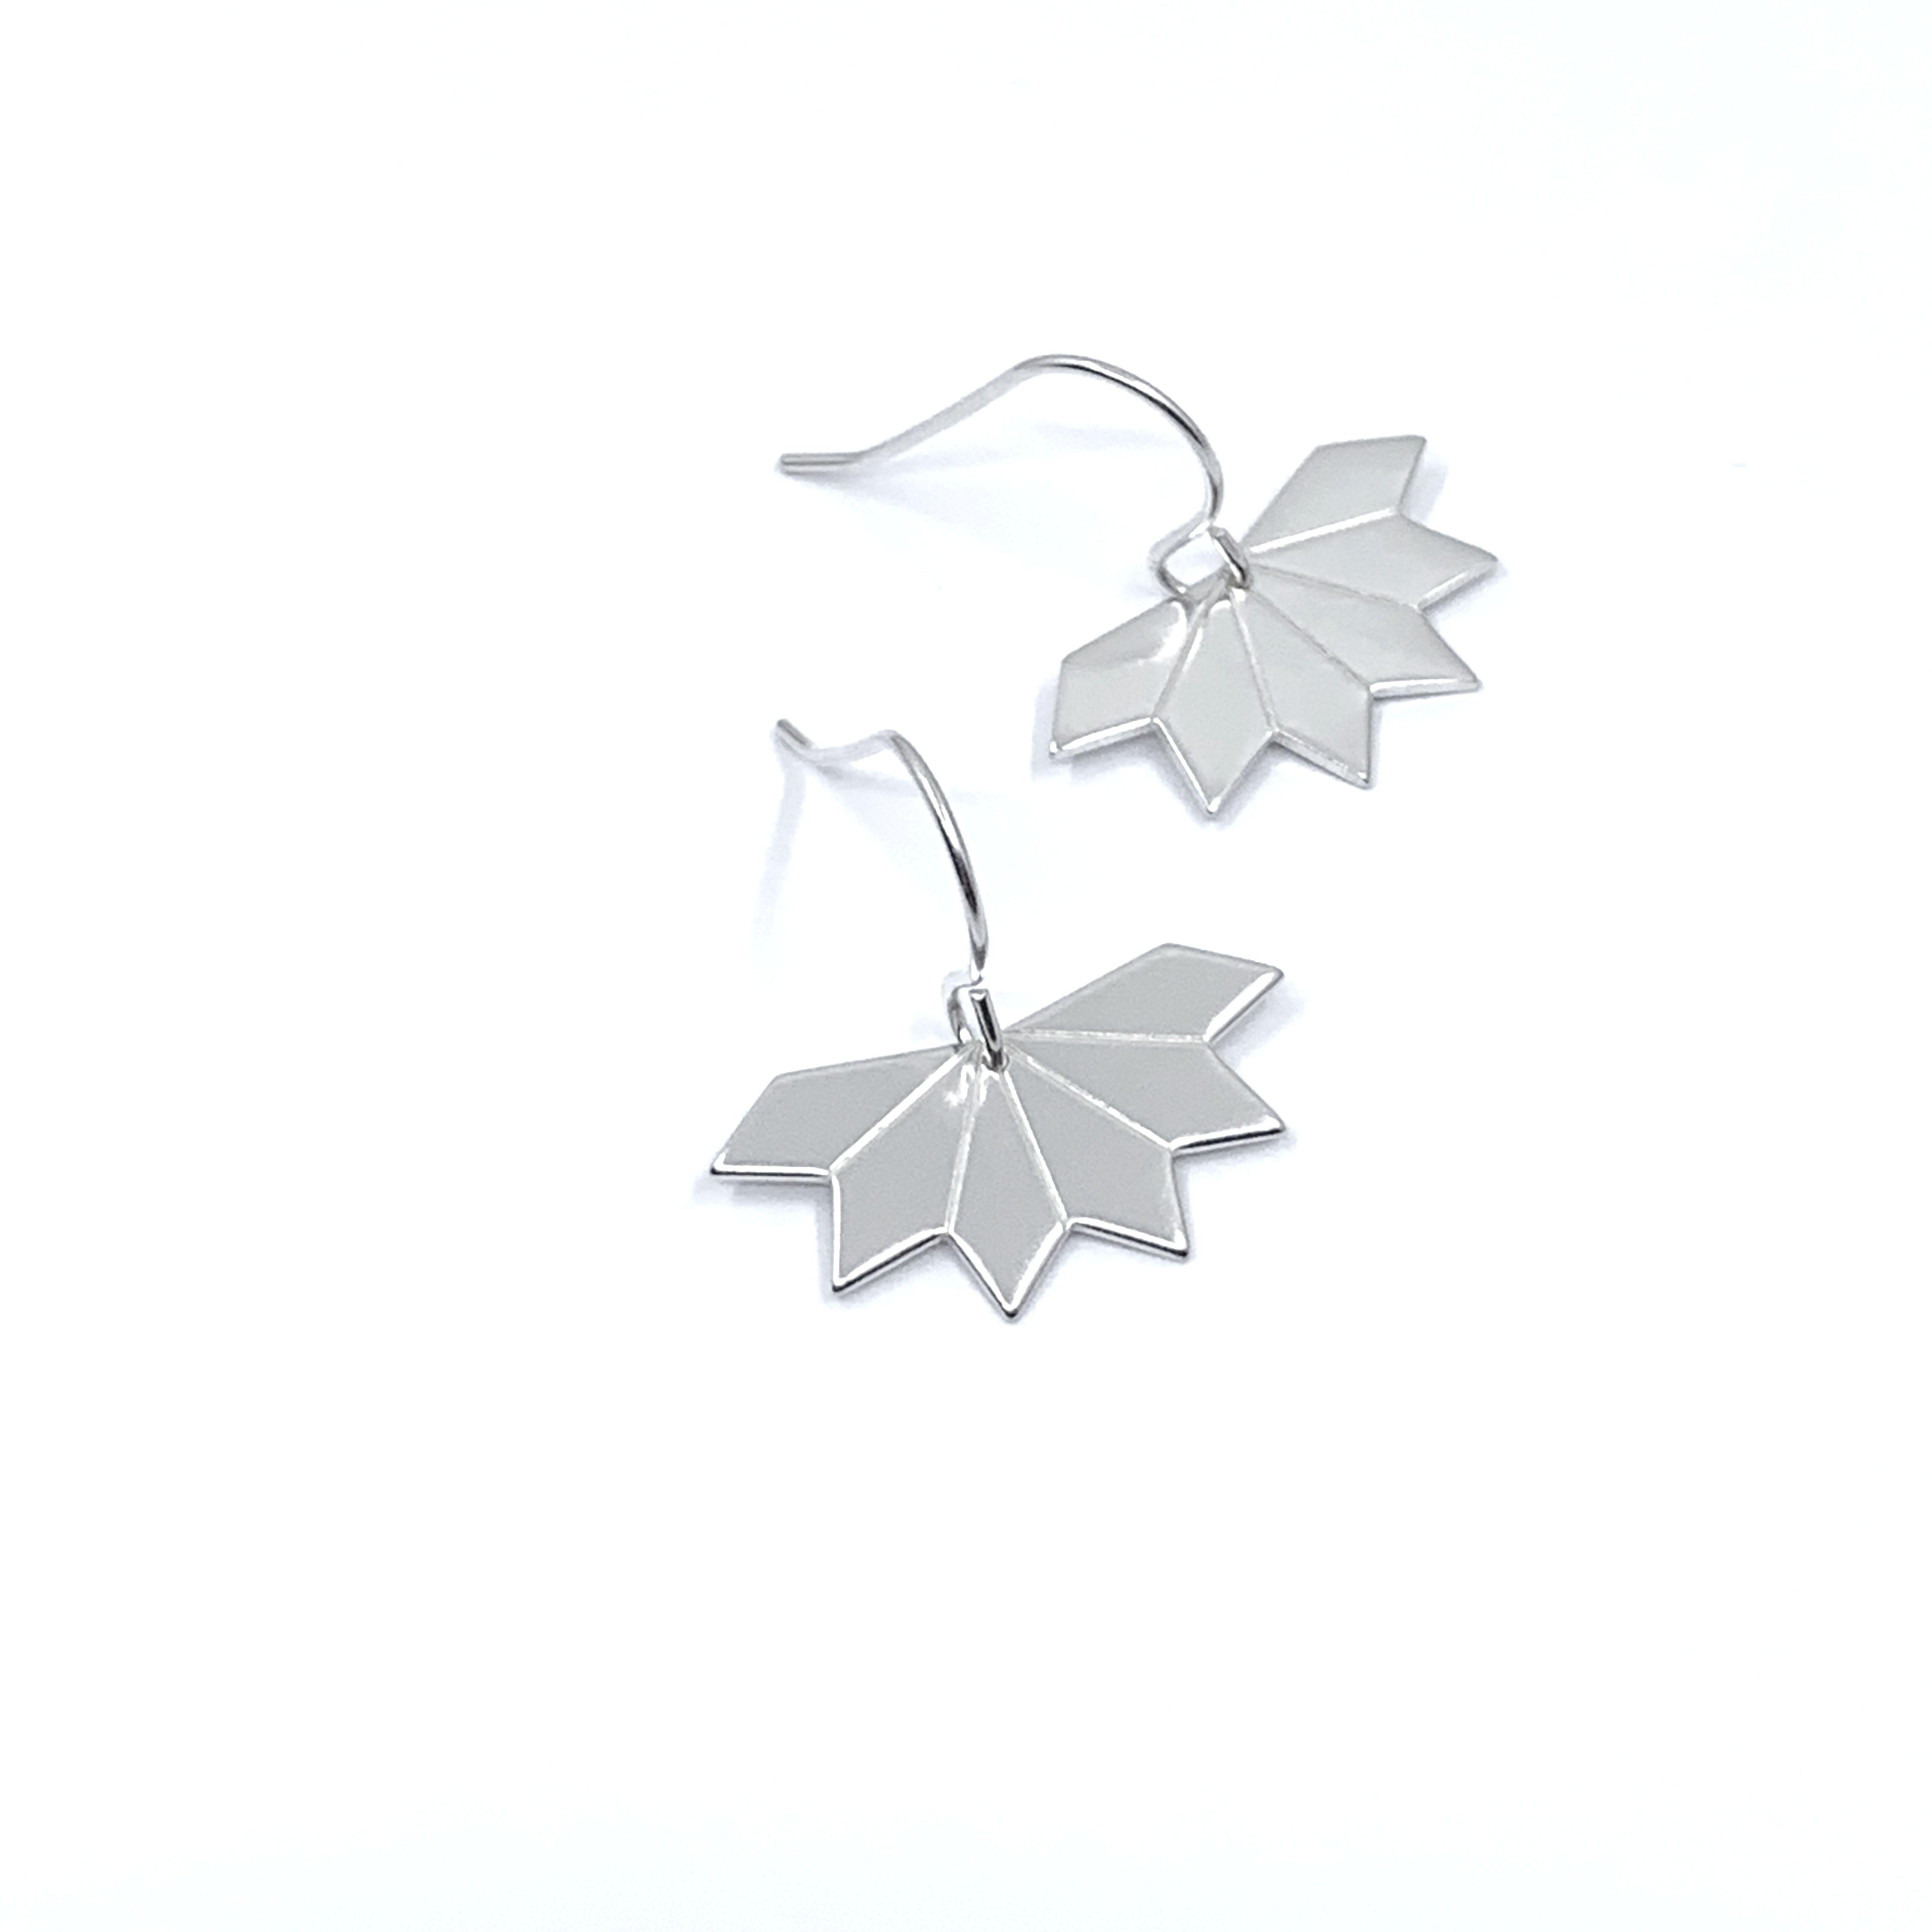 Star fragment silver earrings